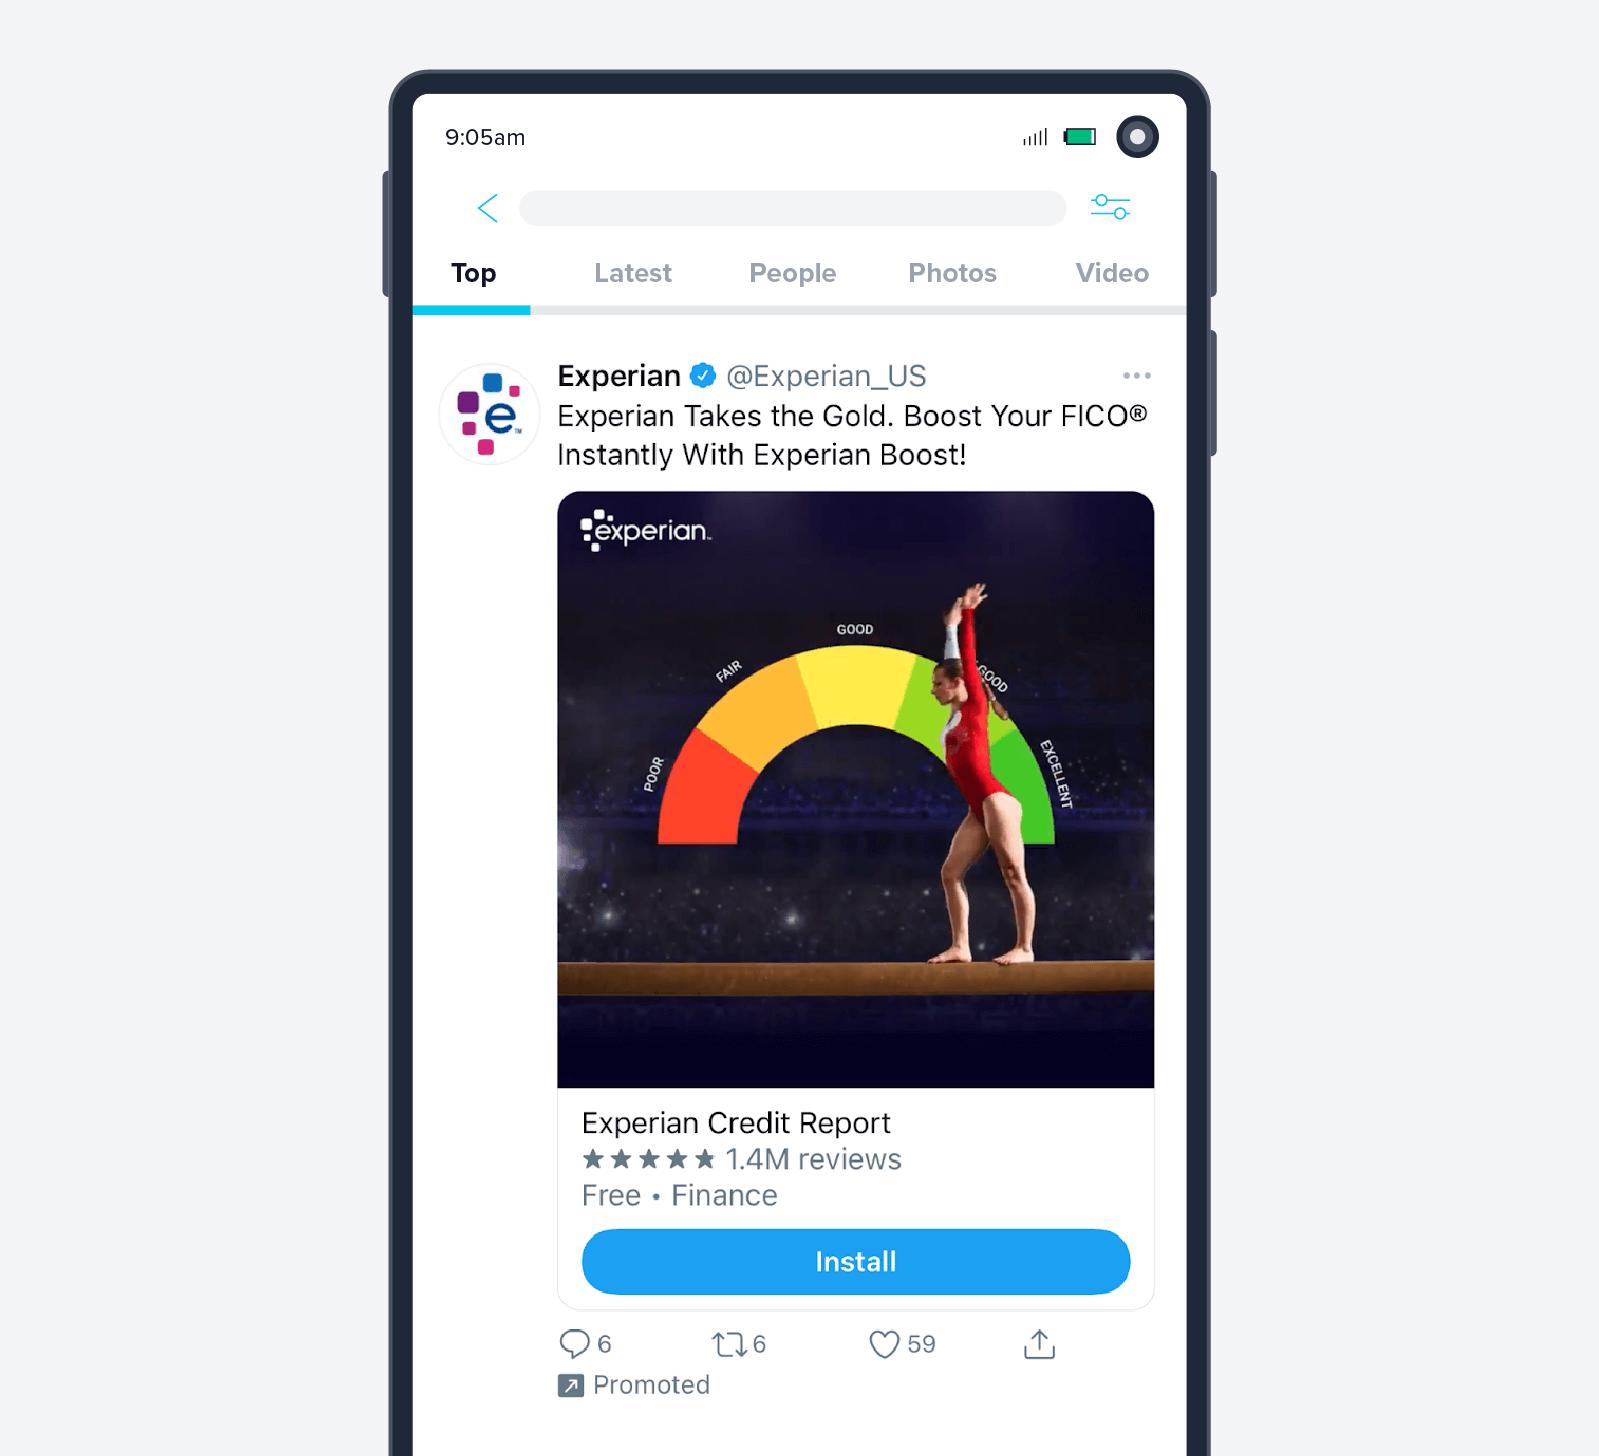 Experian app install ad